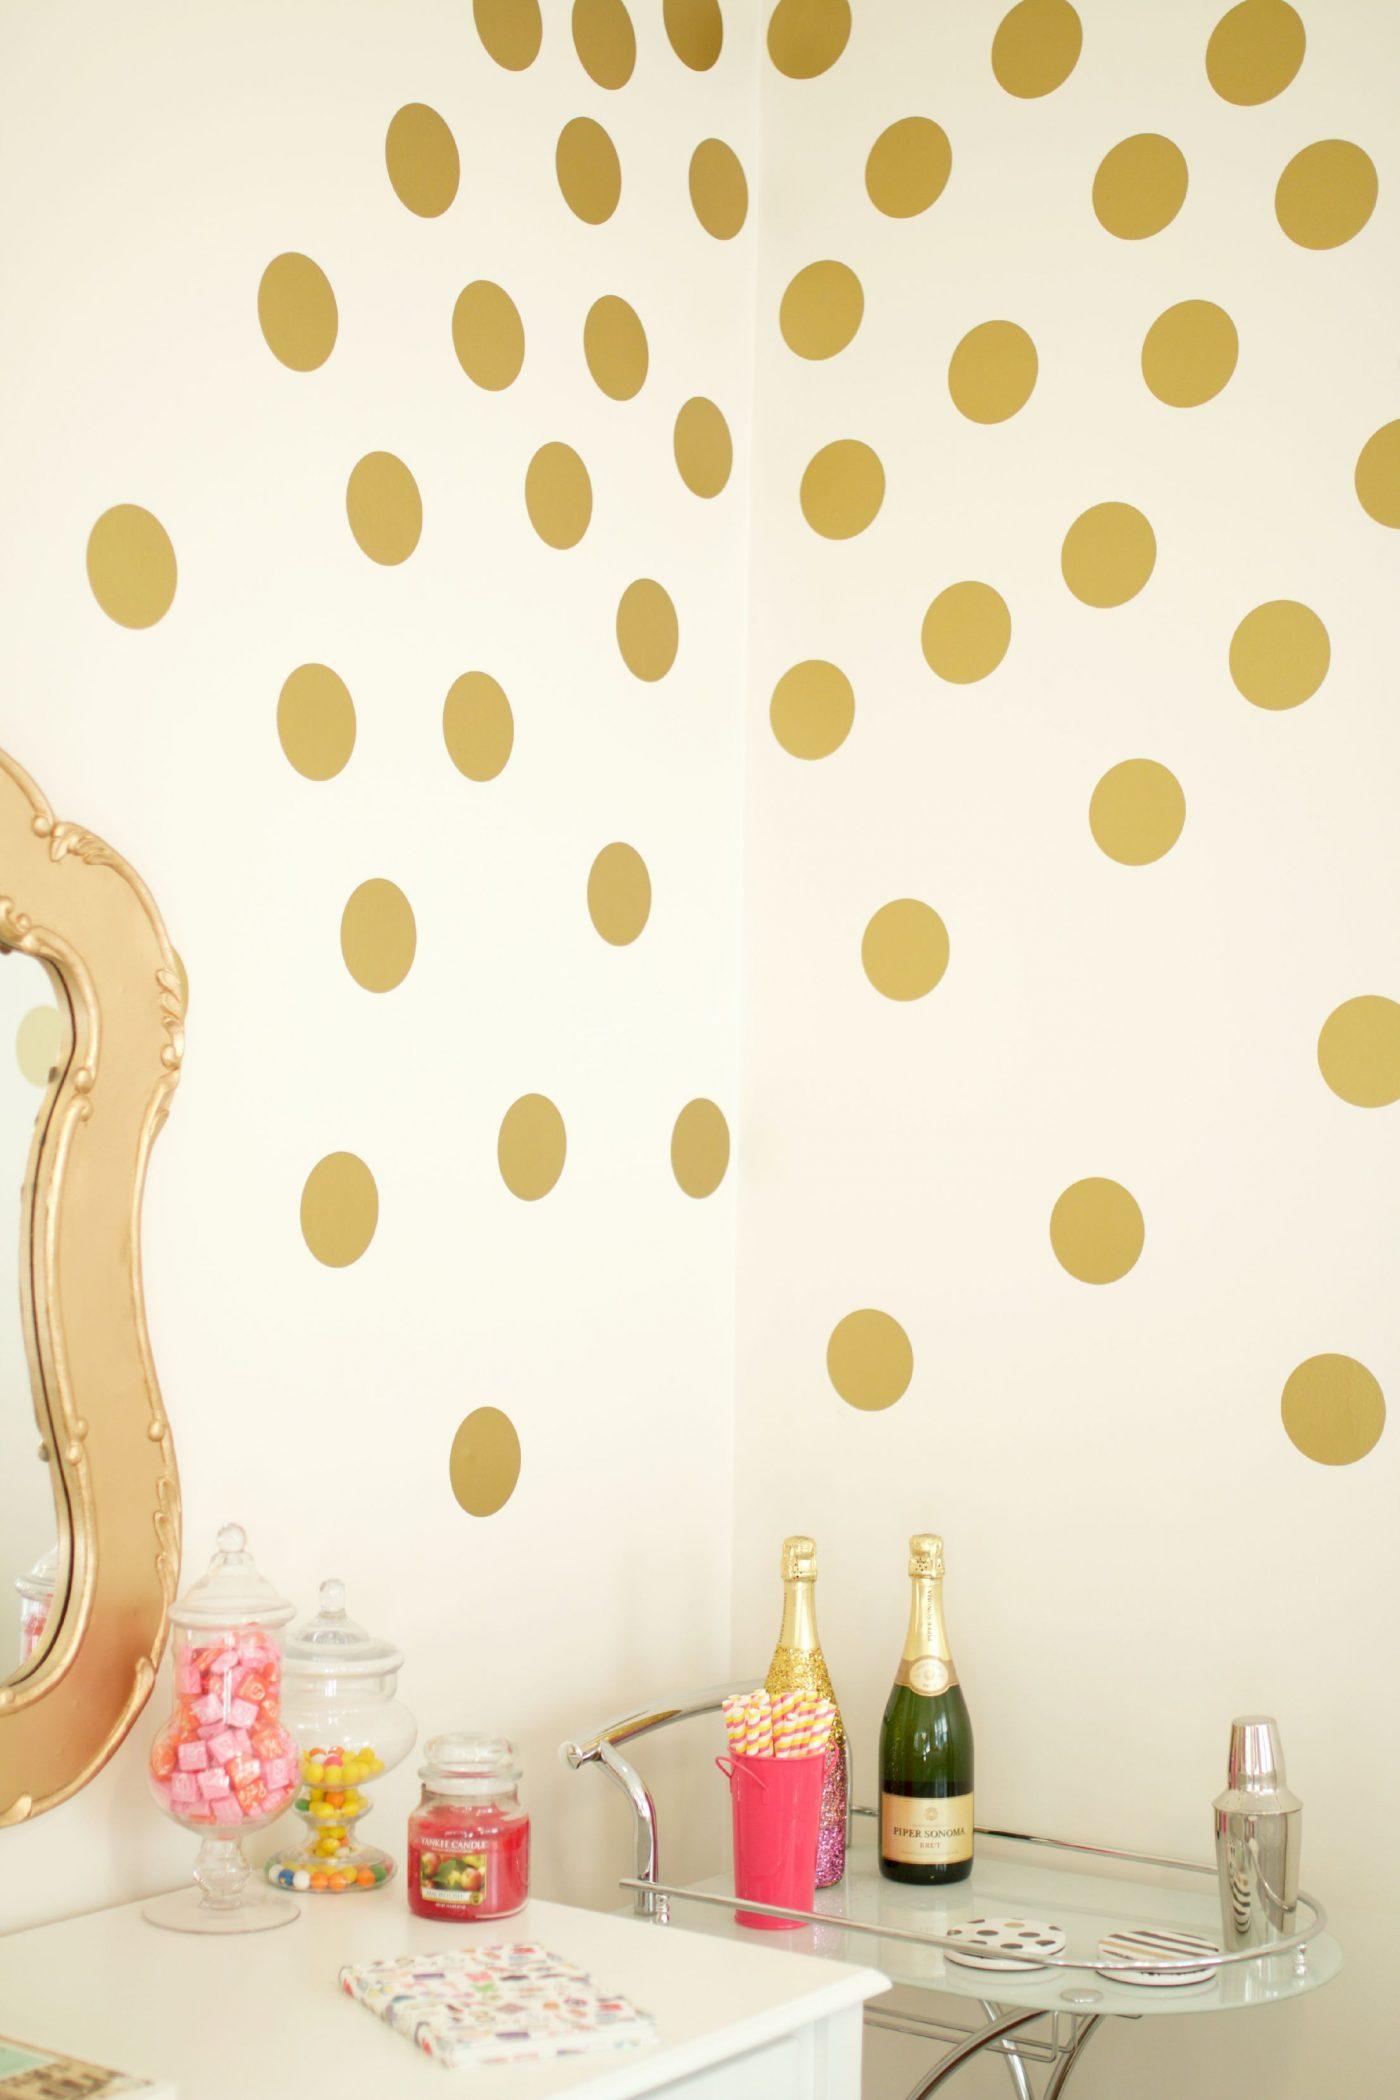 Urbanwalls Gold Polka Dot Wall Decals